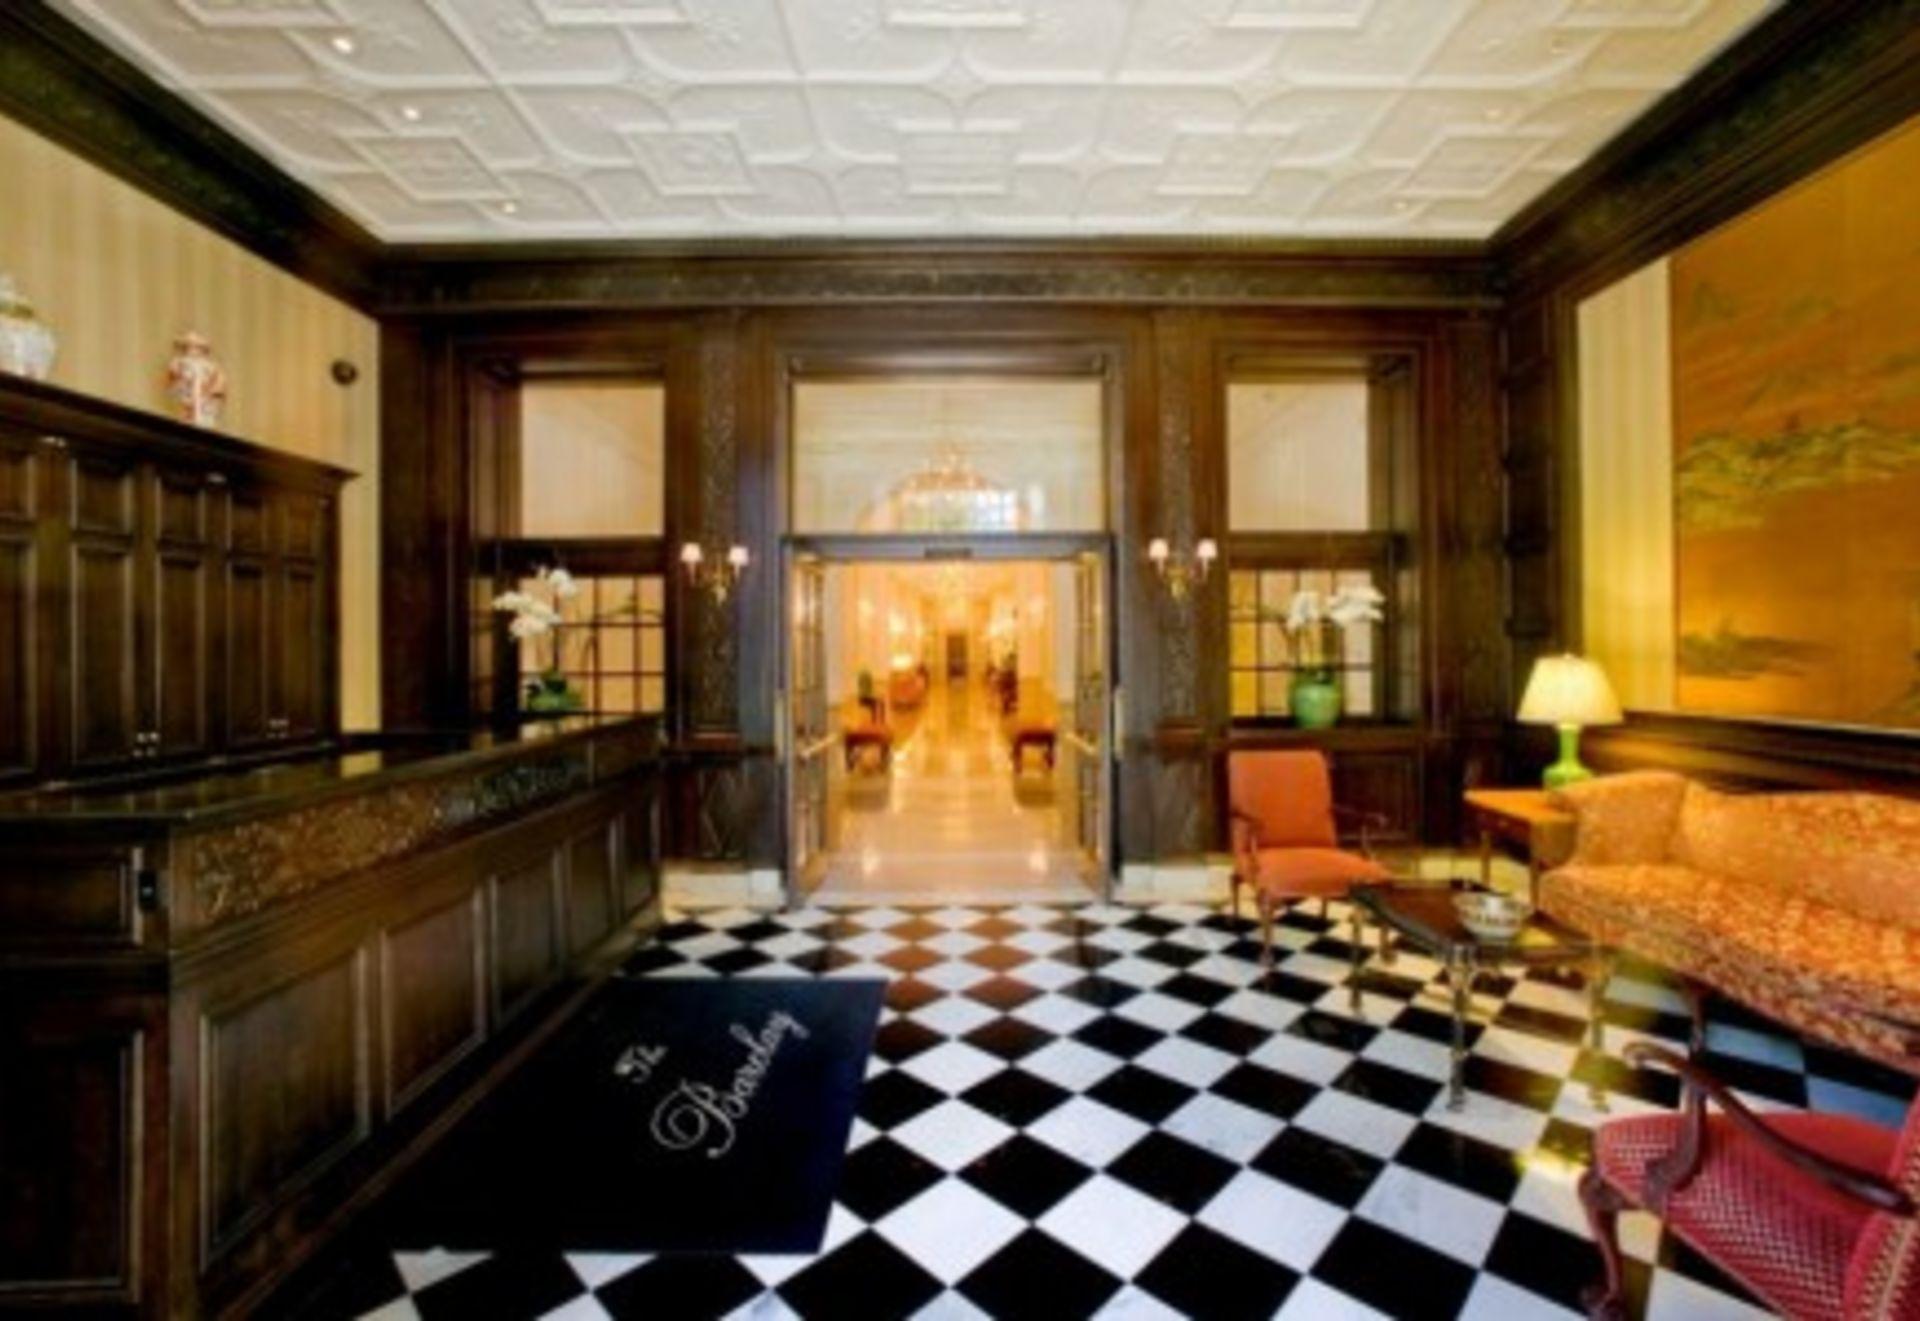 The Barclay Condominiums